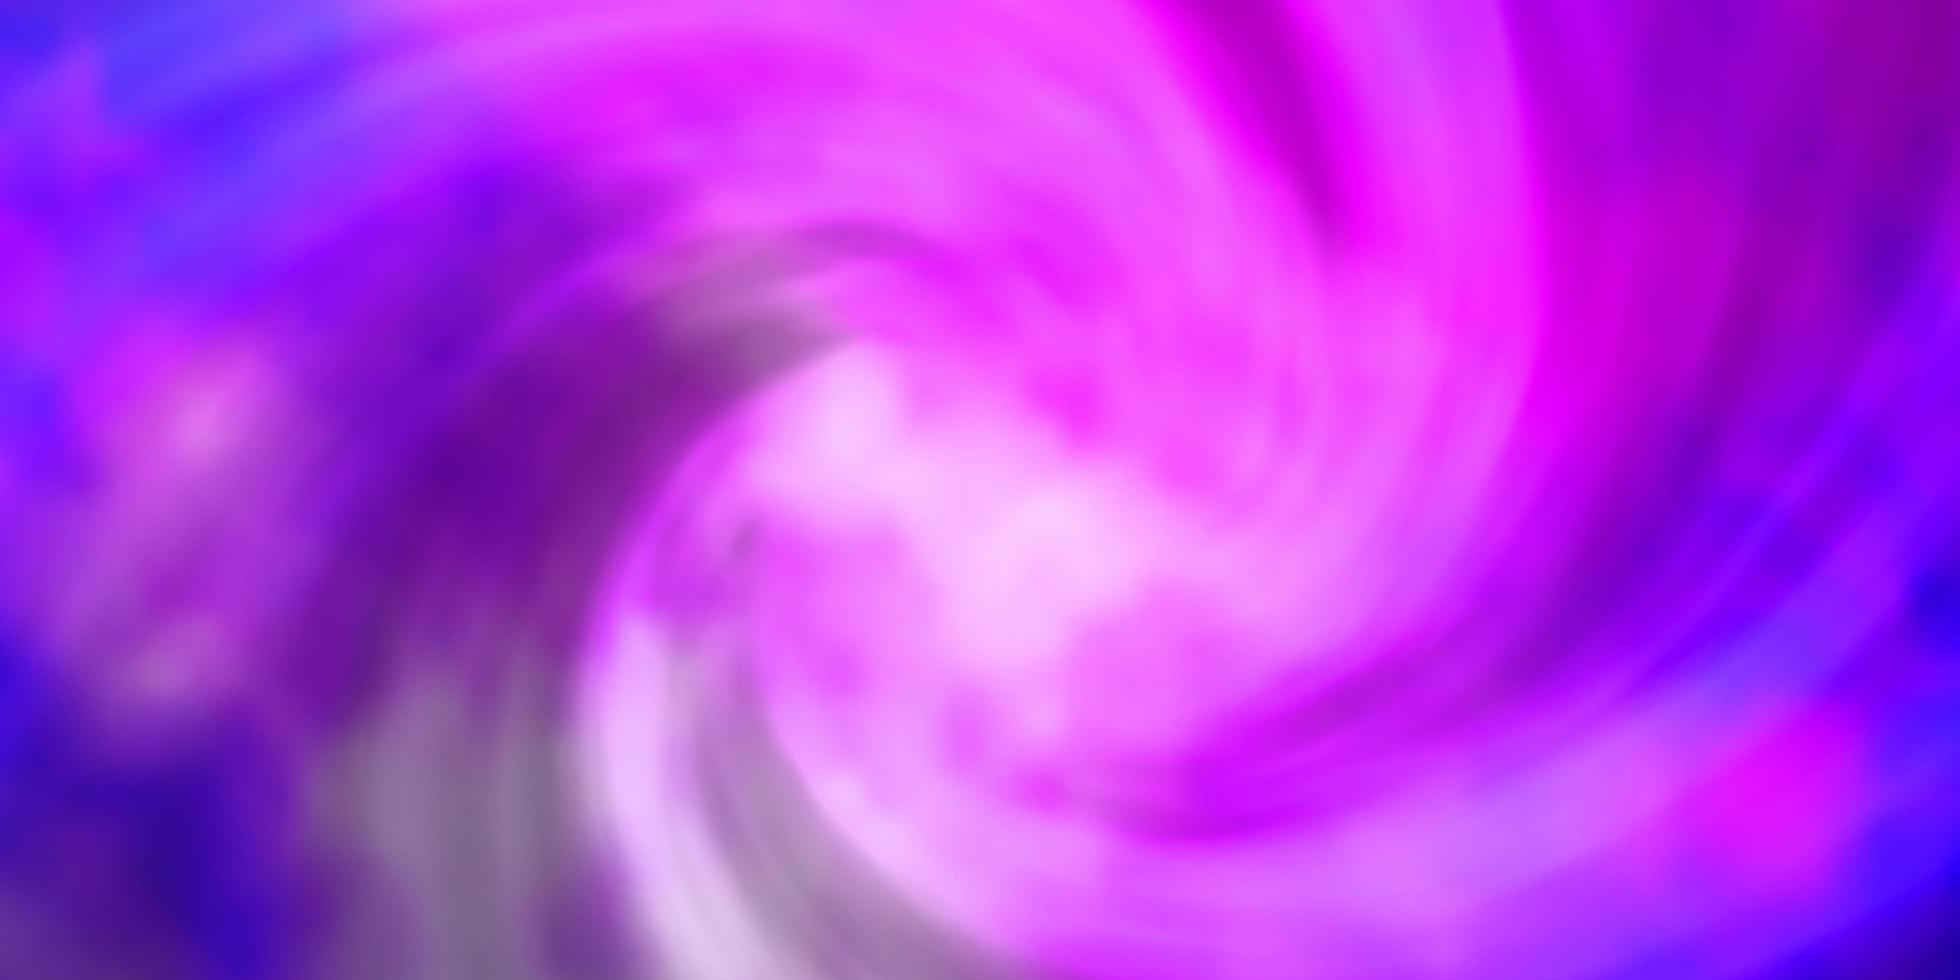 ljuslila vektor bakgrund med cumulus.